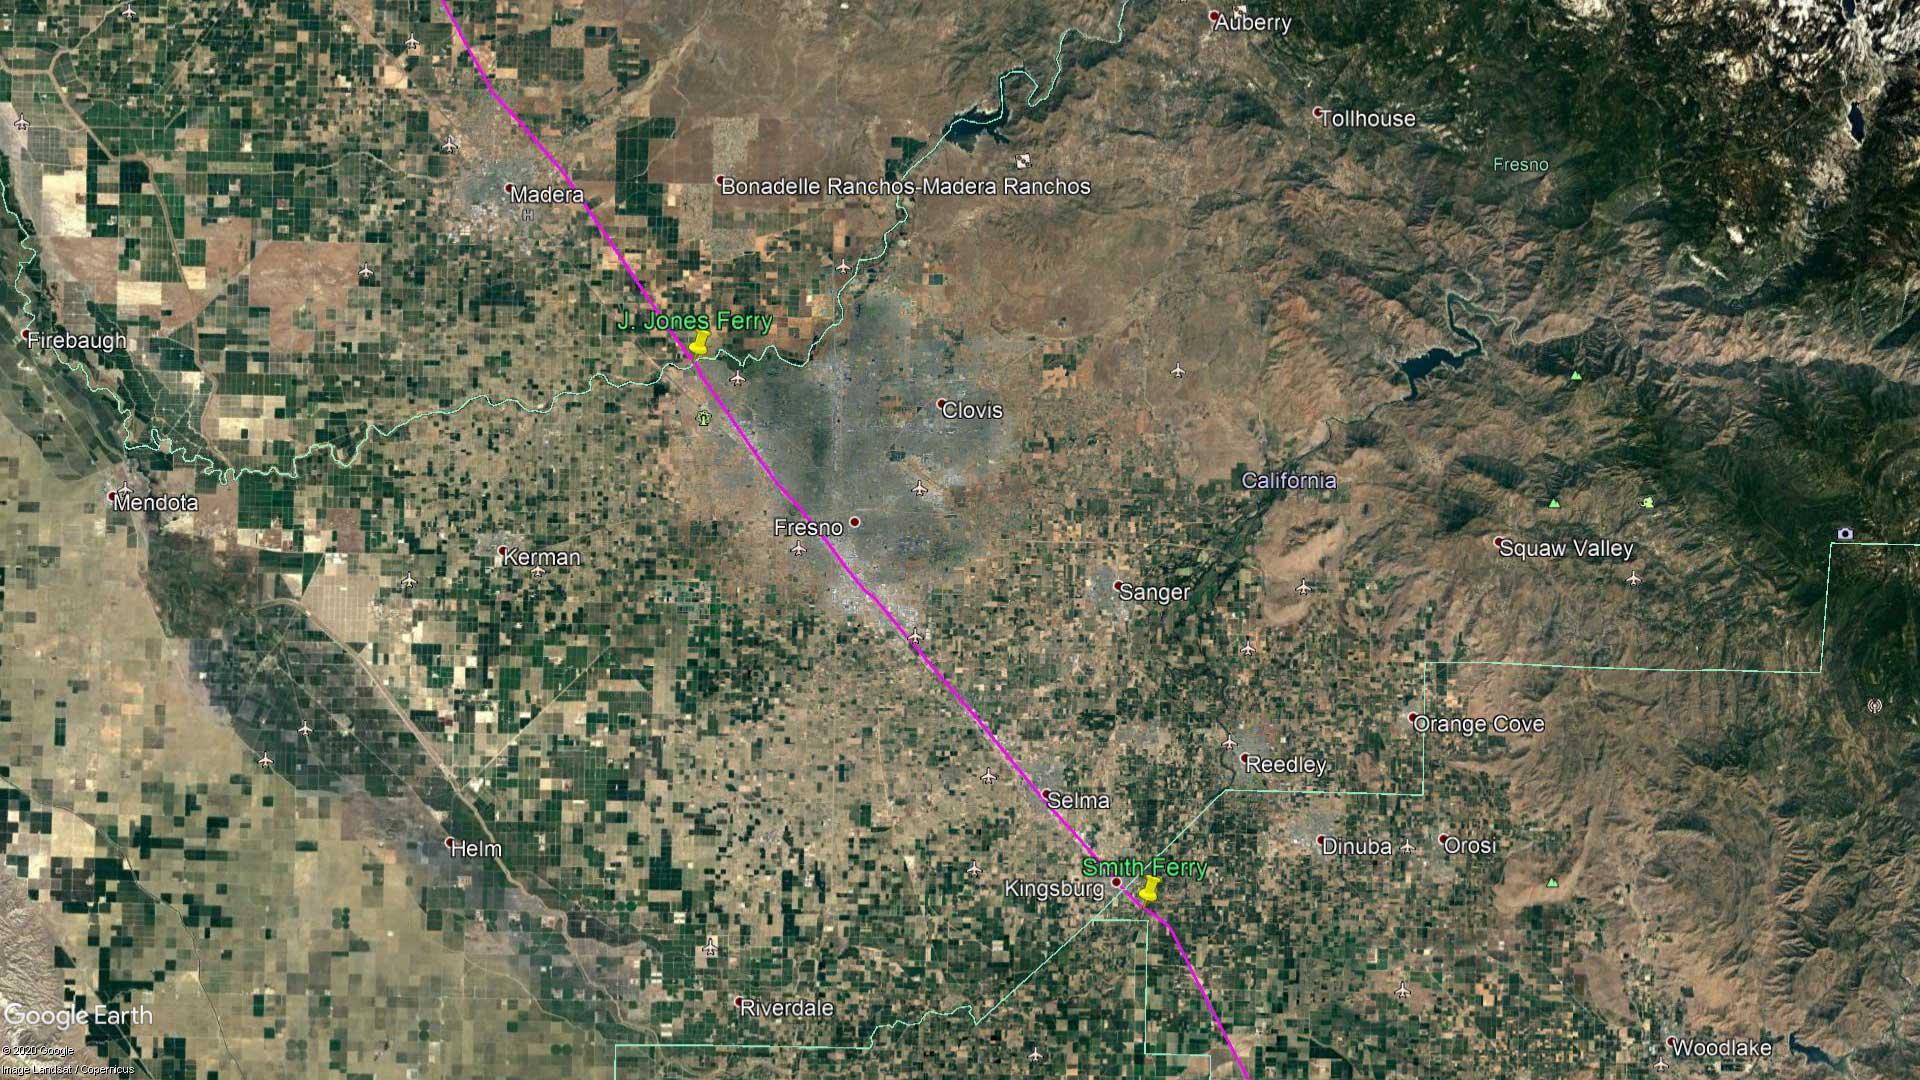 May 17, 1870 - The San Joaquin Valley